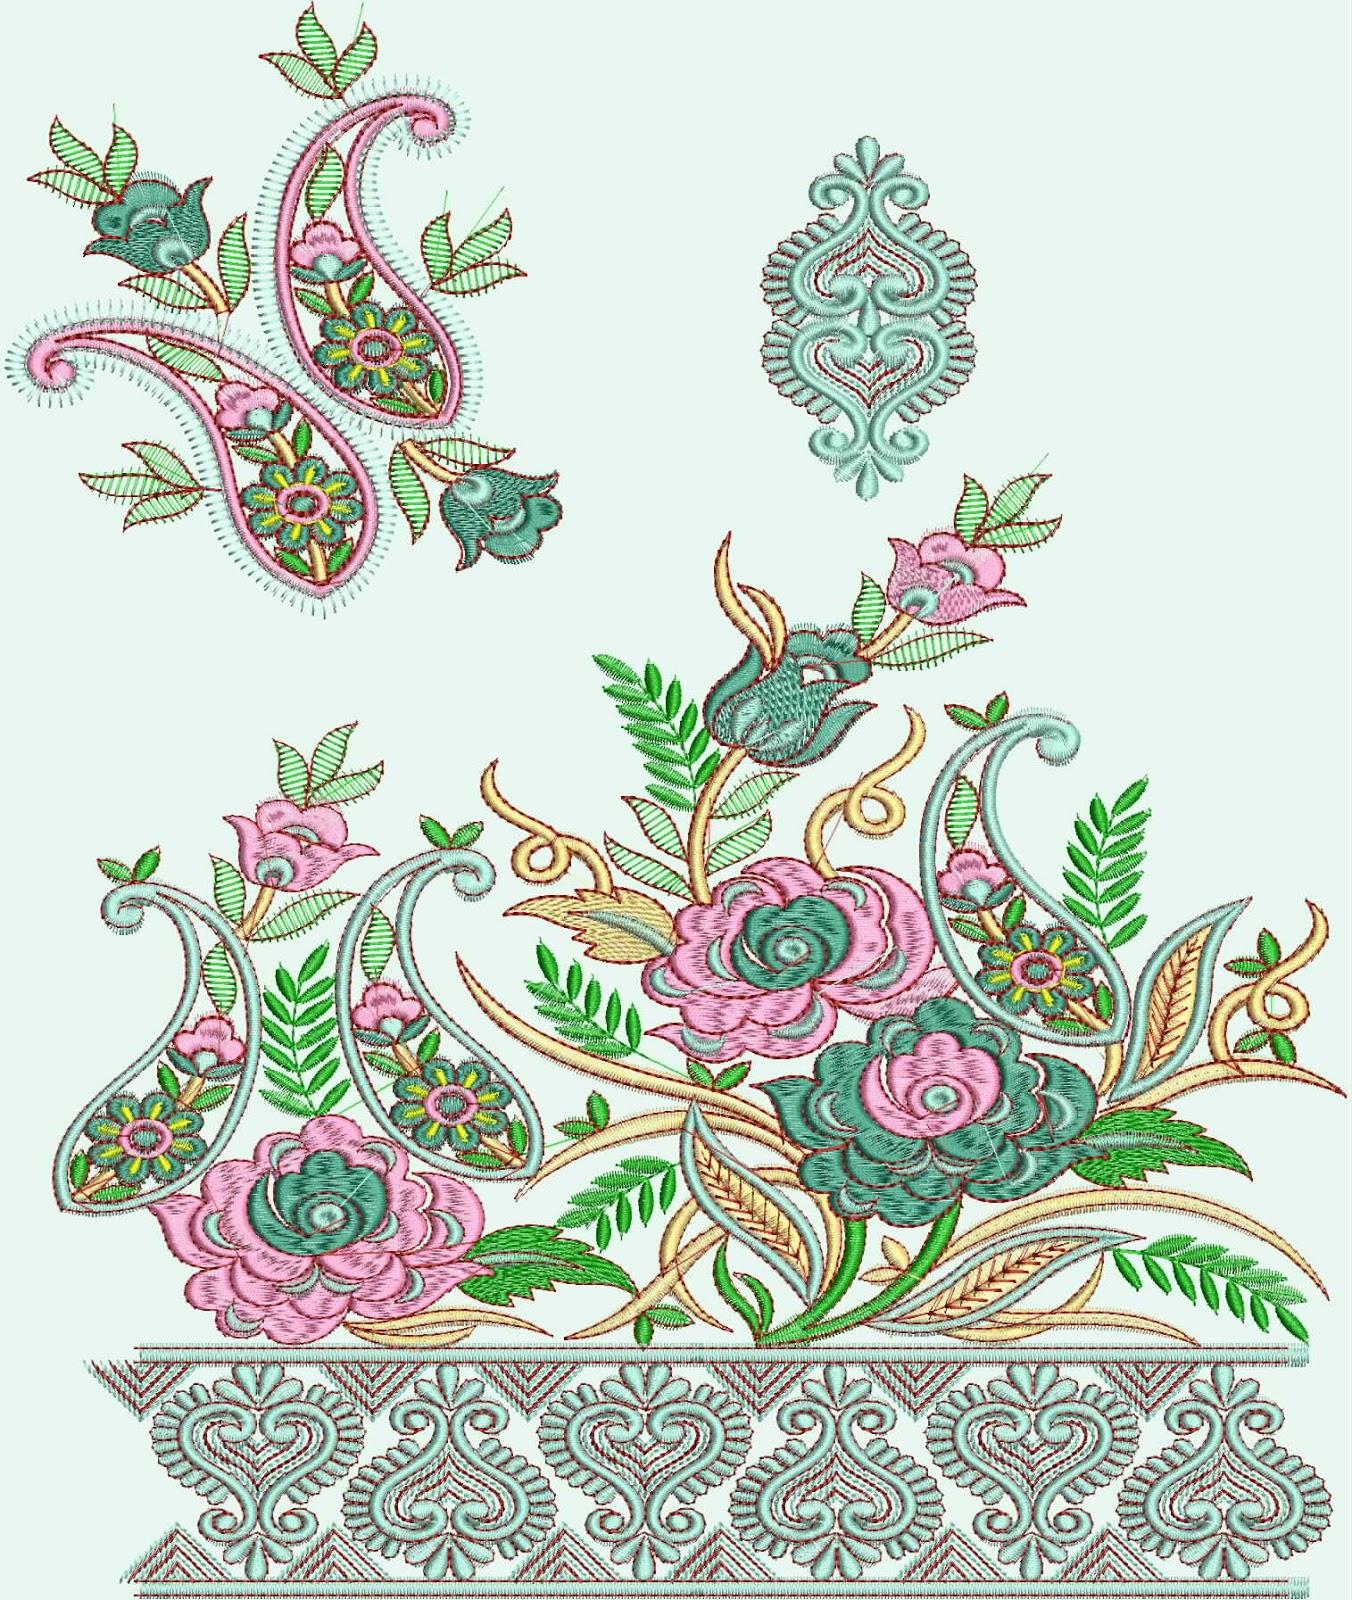 29 amazing saree embroidery patterns makaroka kancheepuram sarees embroidery designs embdesigntube bankloansurffo Images